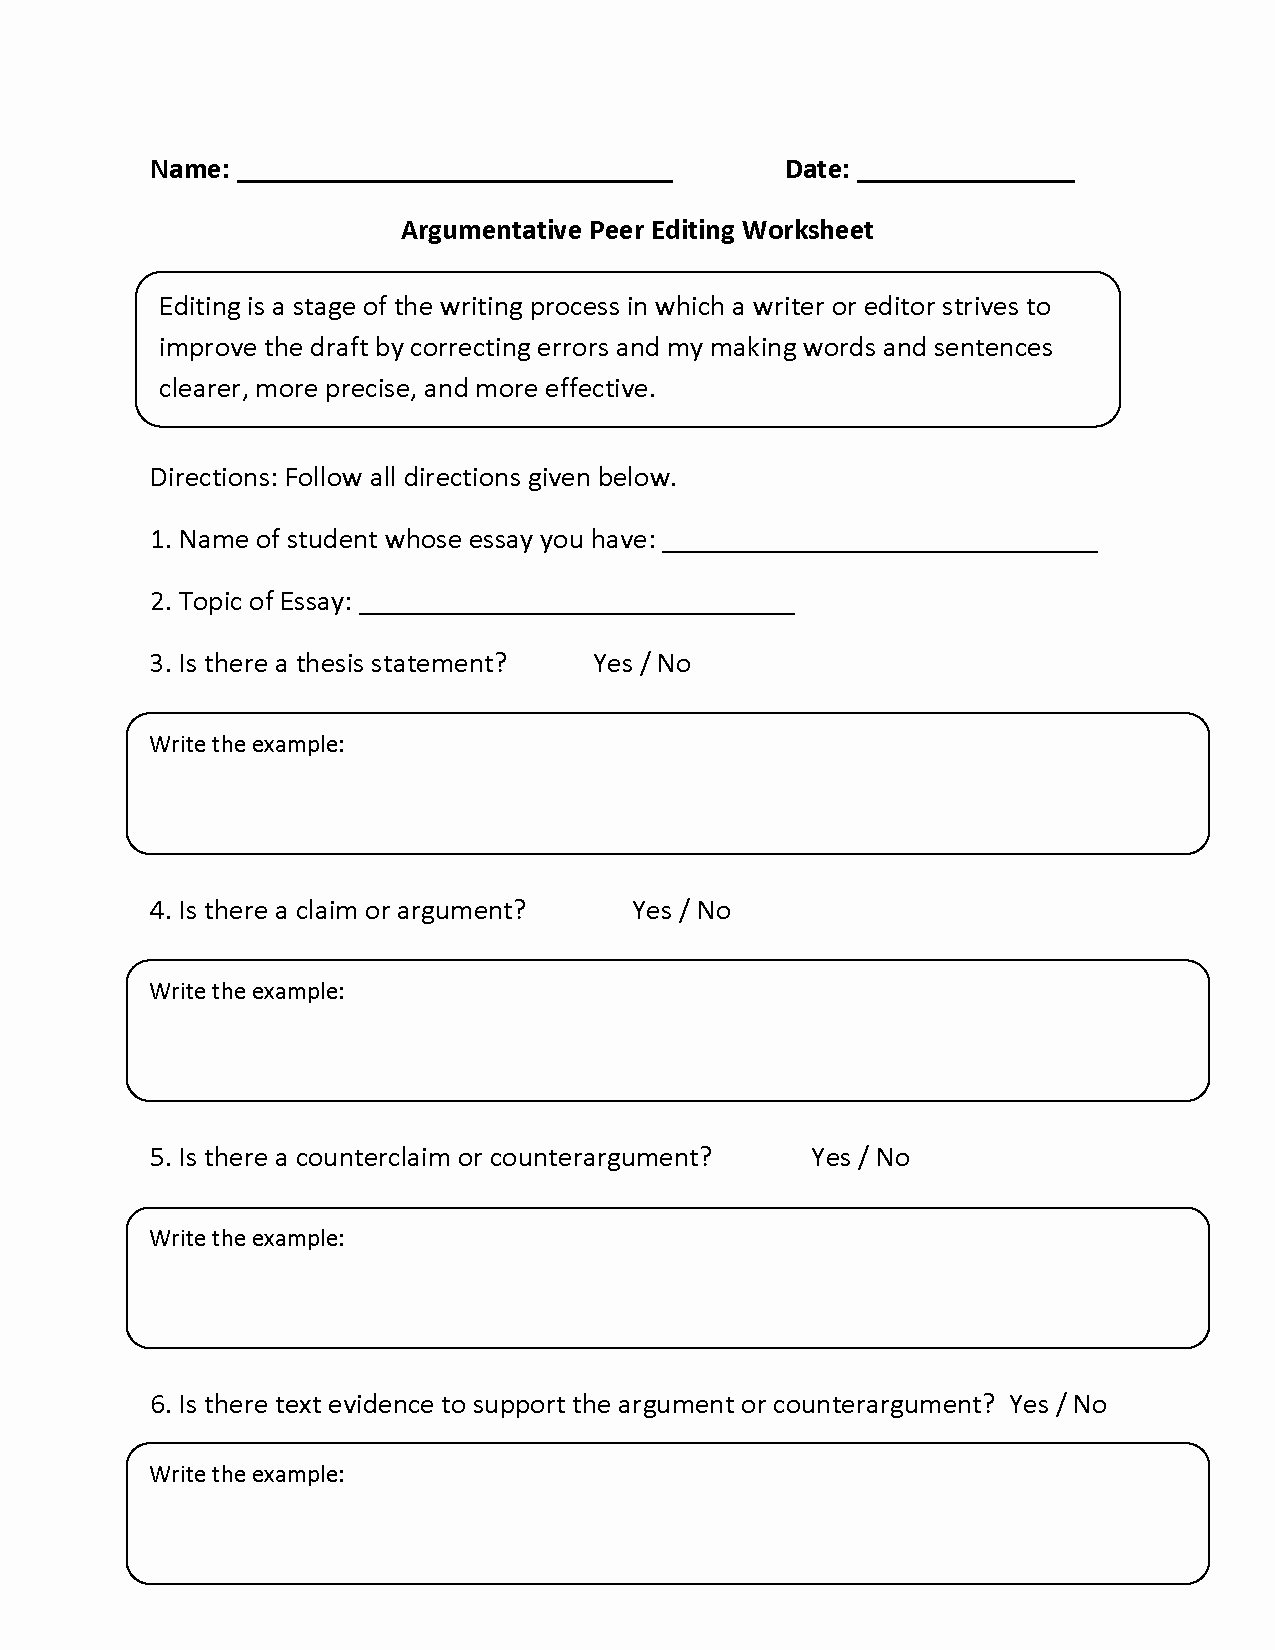 Paragraph Editing Worksheet Awesome Paragraph Editing Worksheets